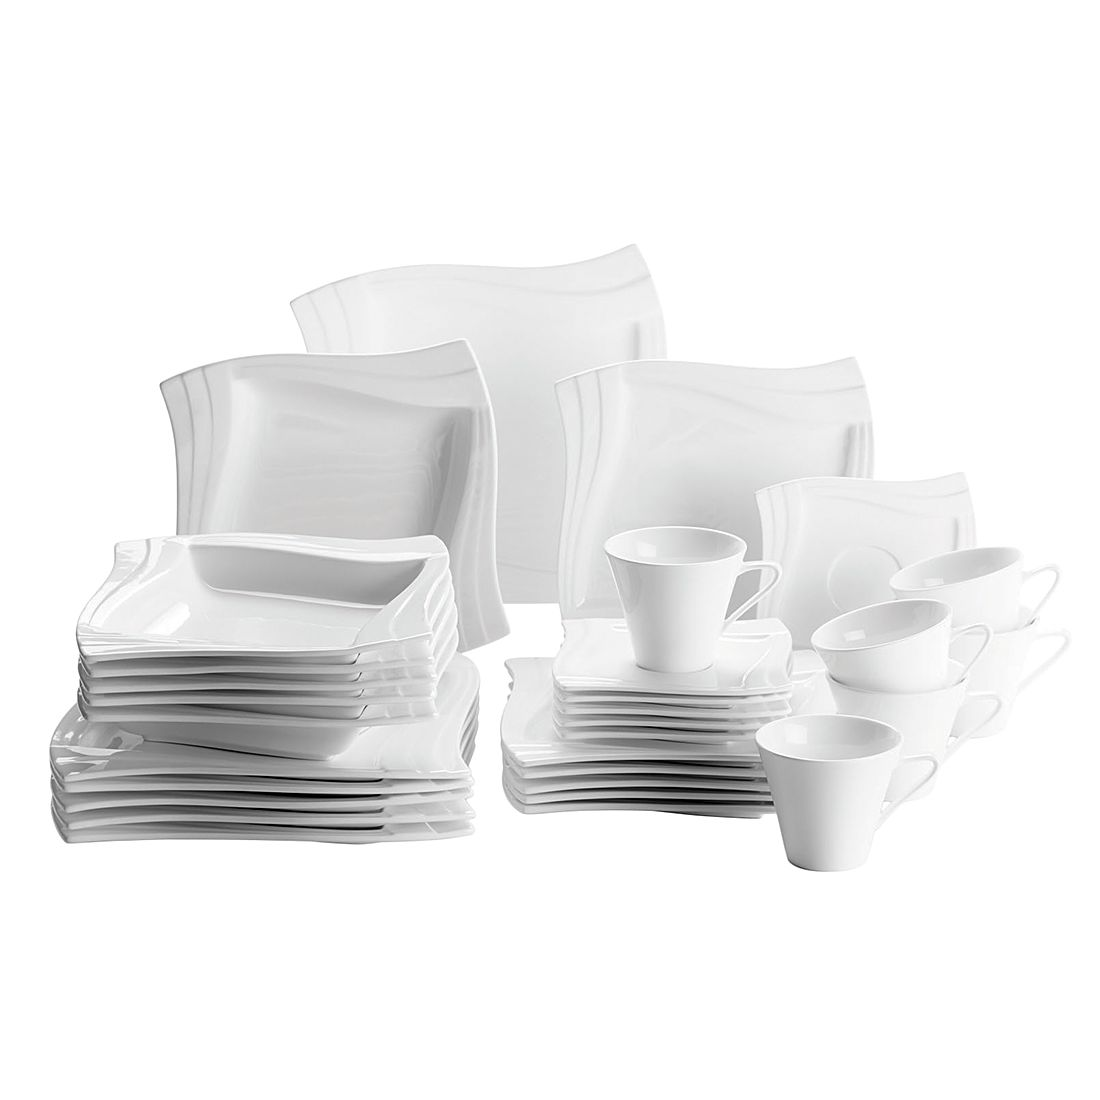 Kombiservice (30- teilig) Molina – Aluminiumporzellan/Weiss, Mäser günstig kaufen